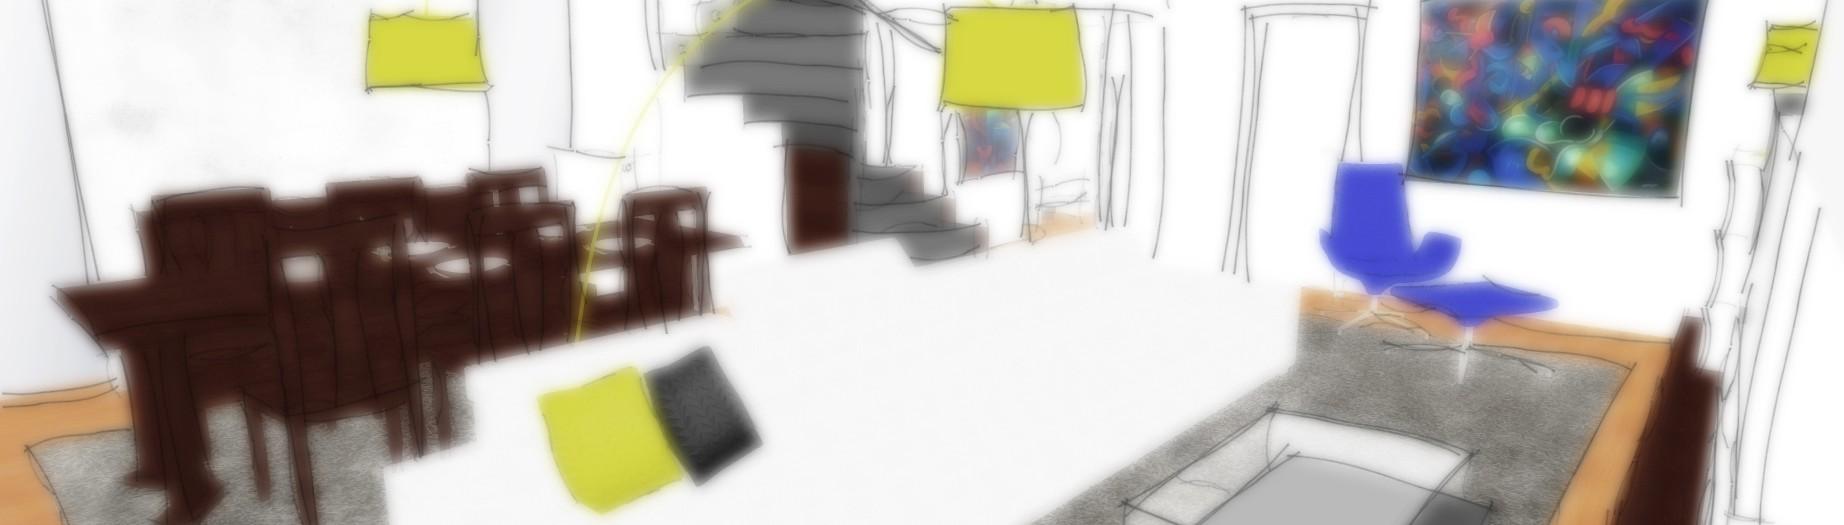 navrh interieru obyvaciho pokoje s jidelnou navrhy interiery interier obyvaci pokoj jidelna jidelny schody schodiste se schodistem architekt designer architekti designeri moderni modernich moderniho home house modern interior architect